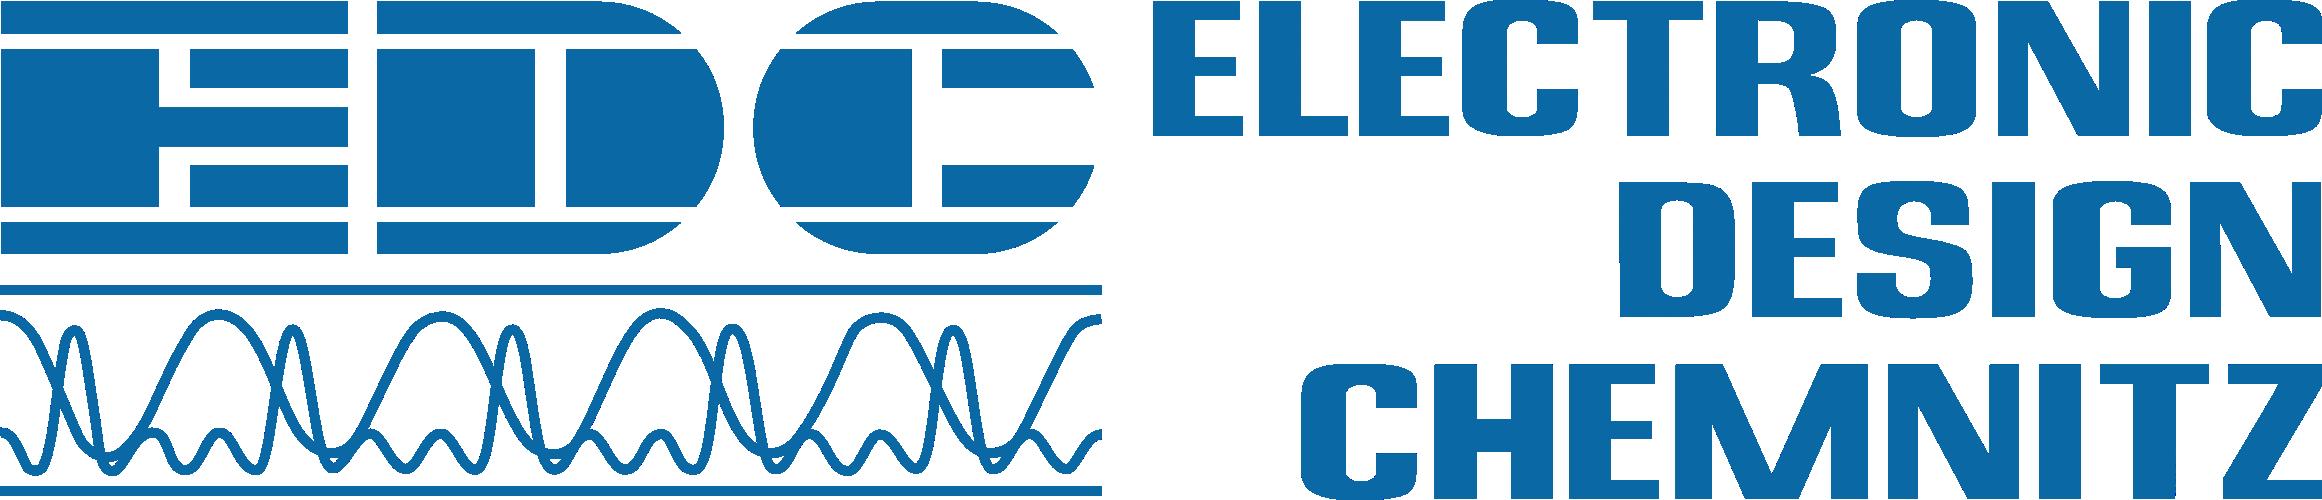 EDC Electronic Design Chemnitz GmbH